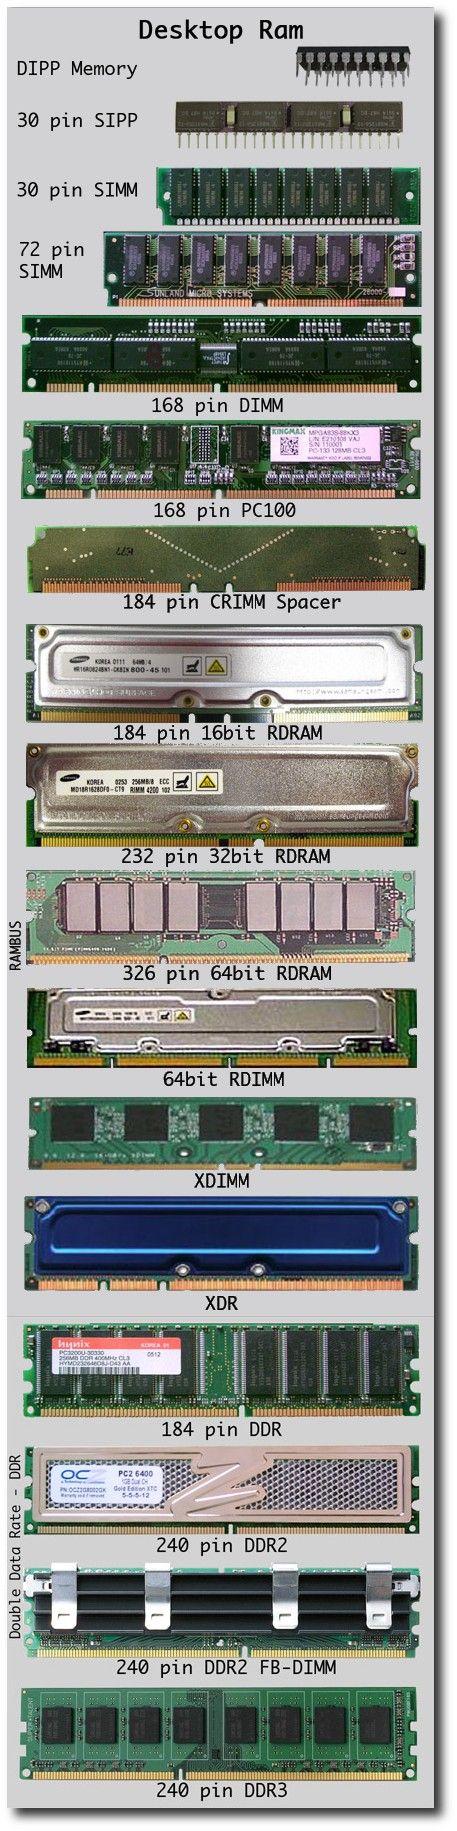 computer hardware chart (desktop ram)